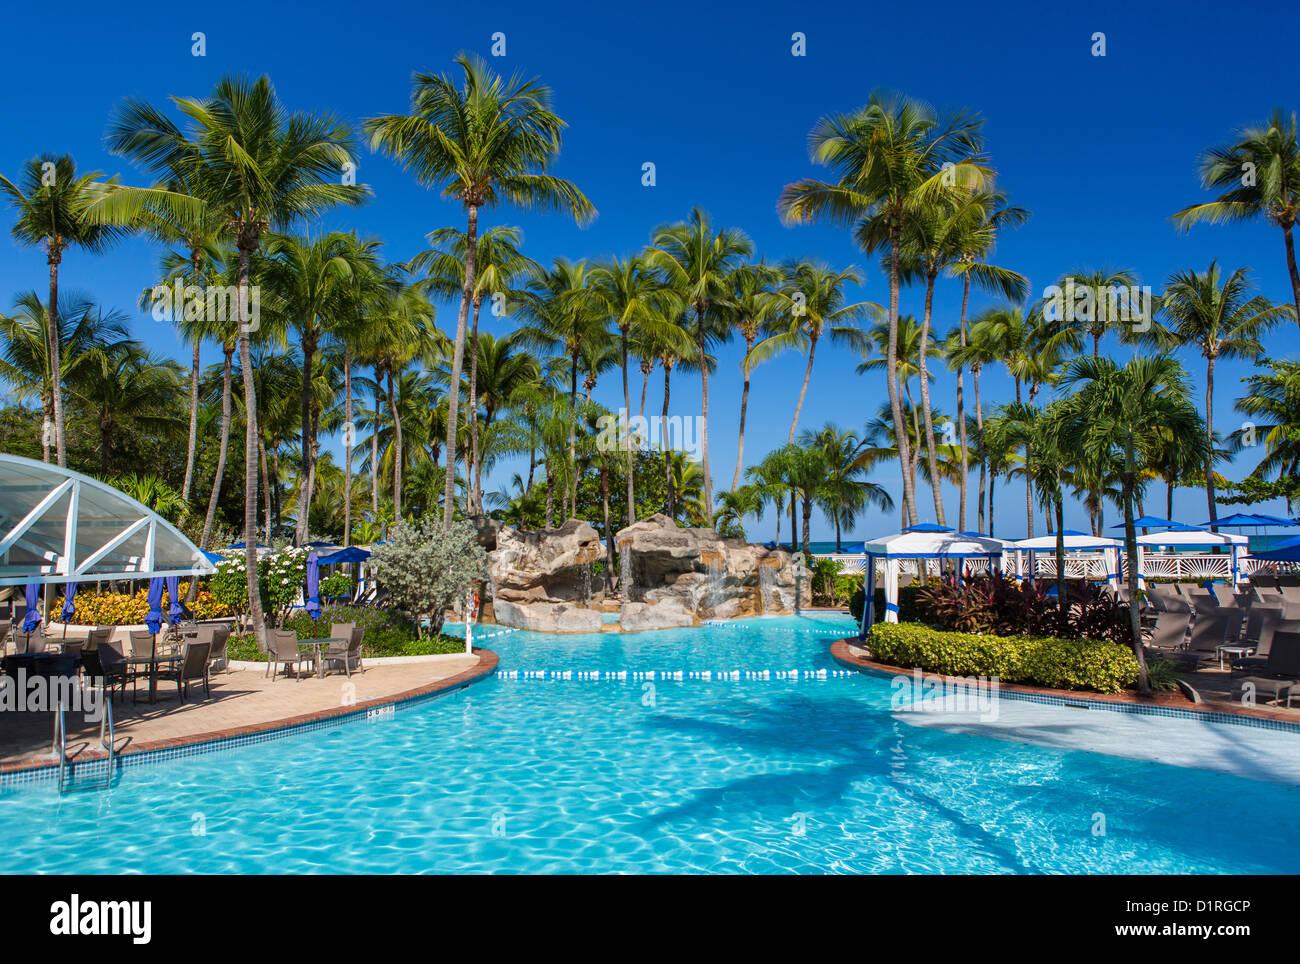 San juan puerto rico swimming pool at intercontinental hotel a beach resort at isla verde